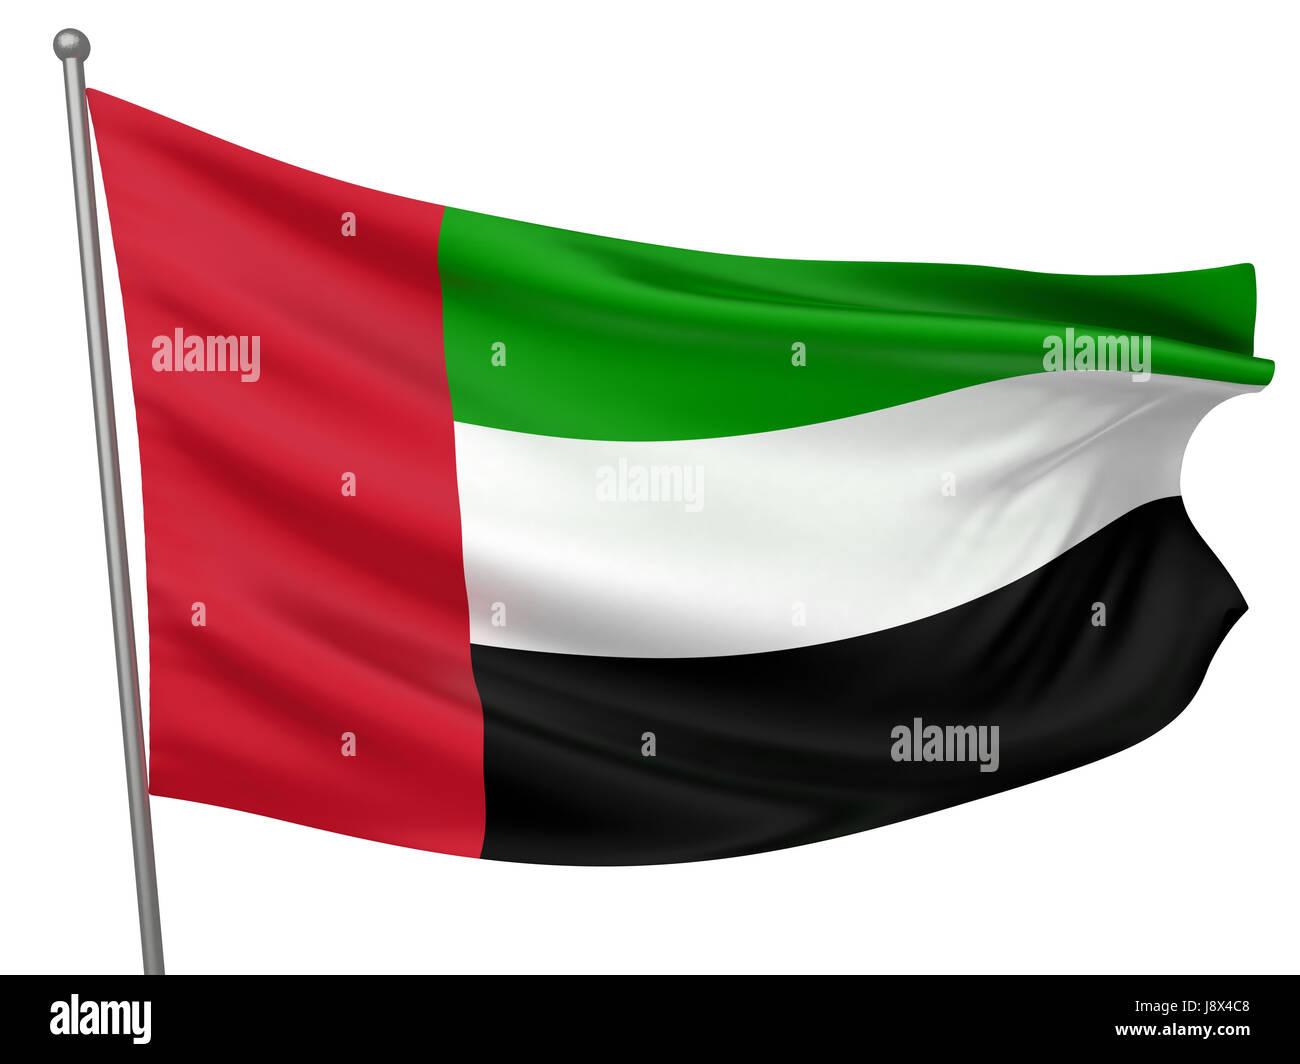 isolated, symbolic, colour, emblem, illustration, flag, arab, banner, country, - Stock Image